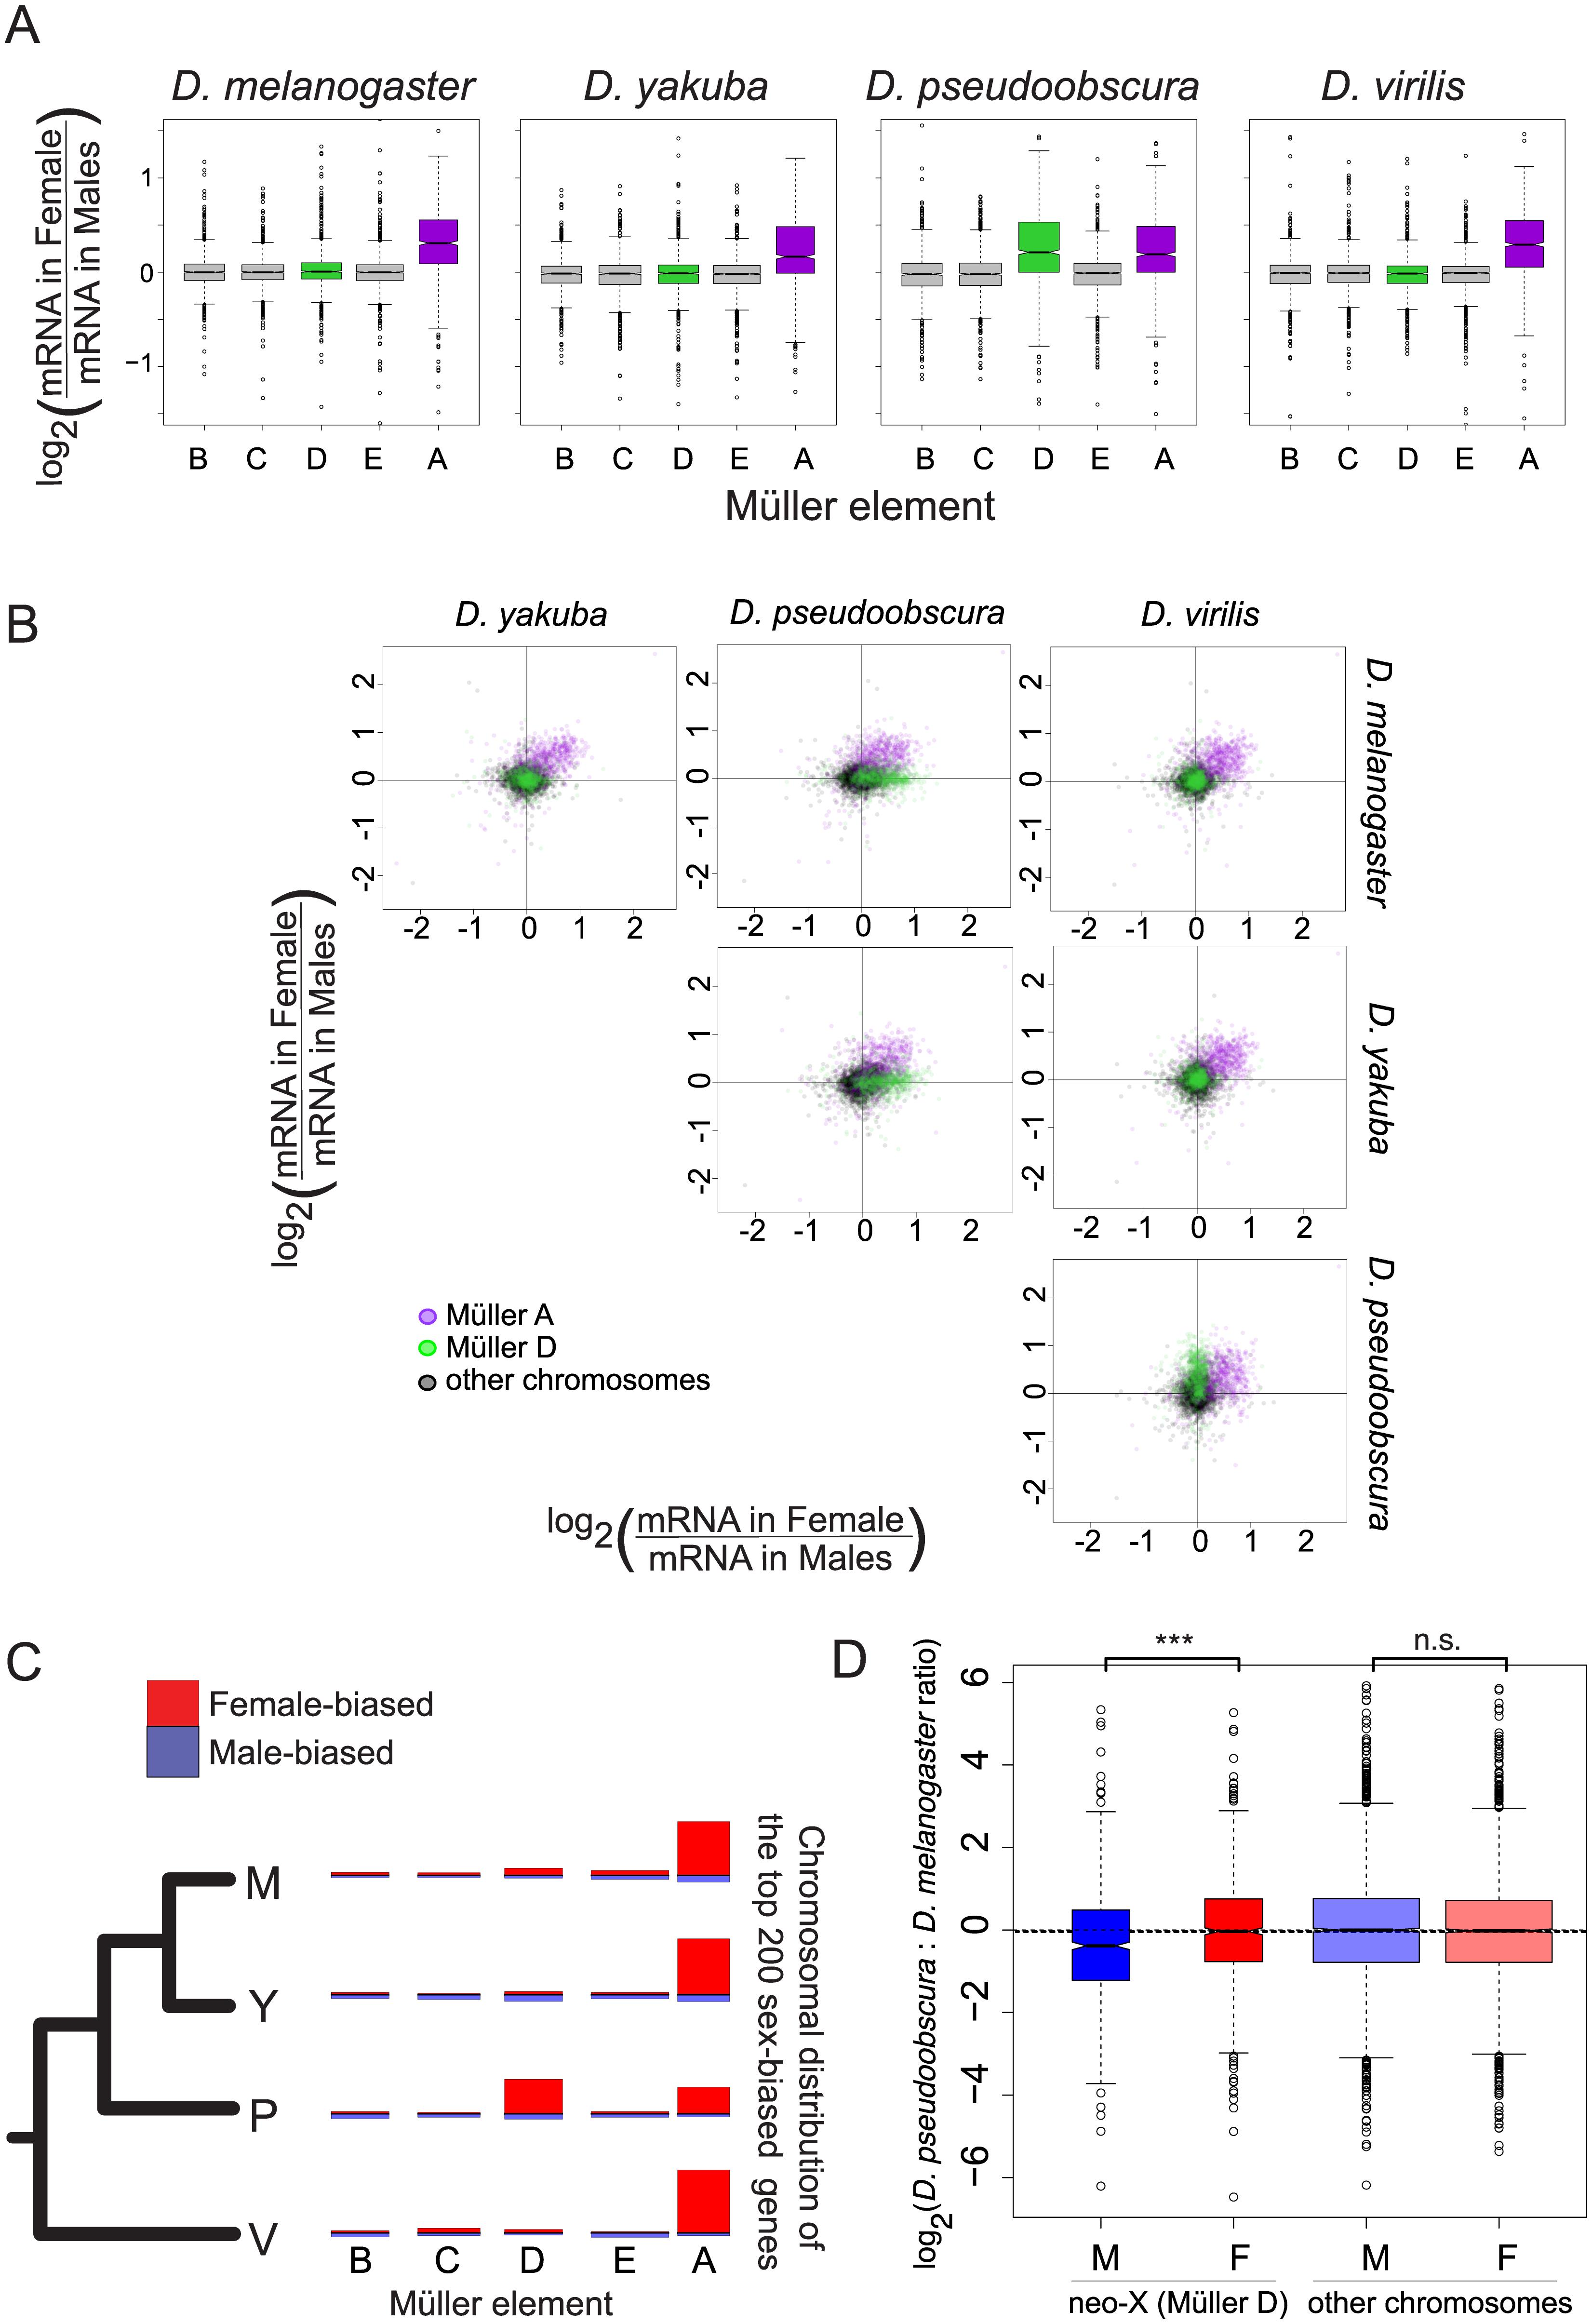 Gene expression on the neo-X (Müller D element) in <i>D</i>. <i>pseudoobscura</i> does not show complete dosage compensation.